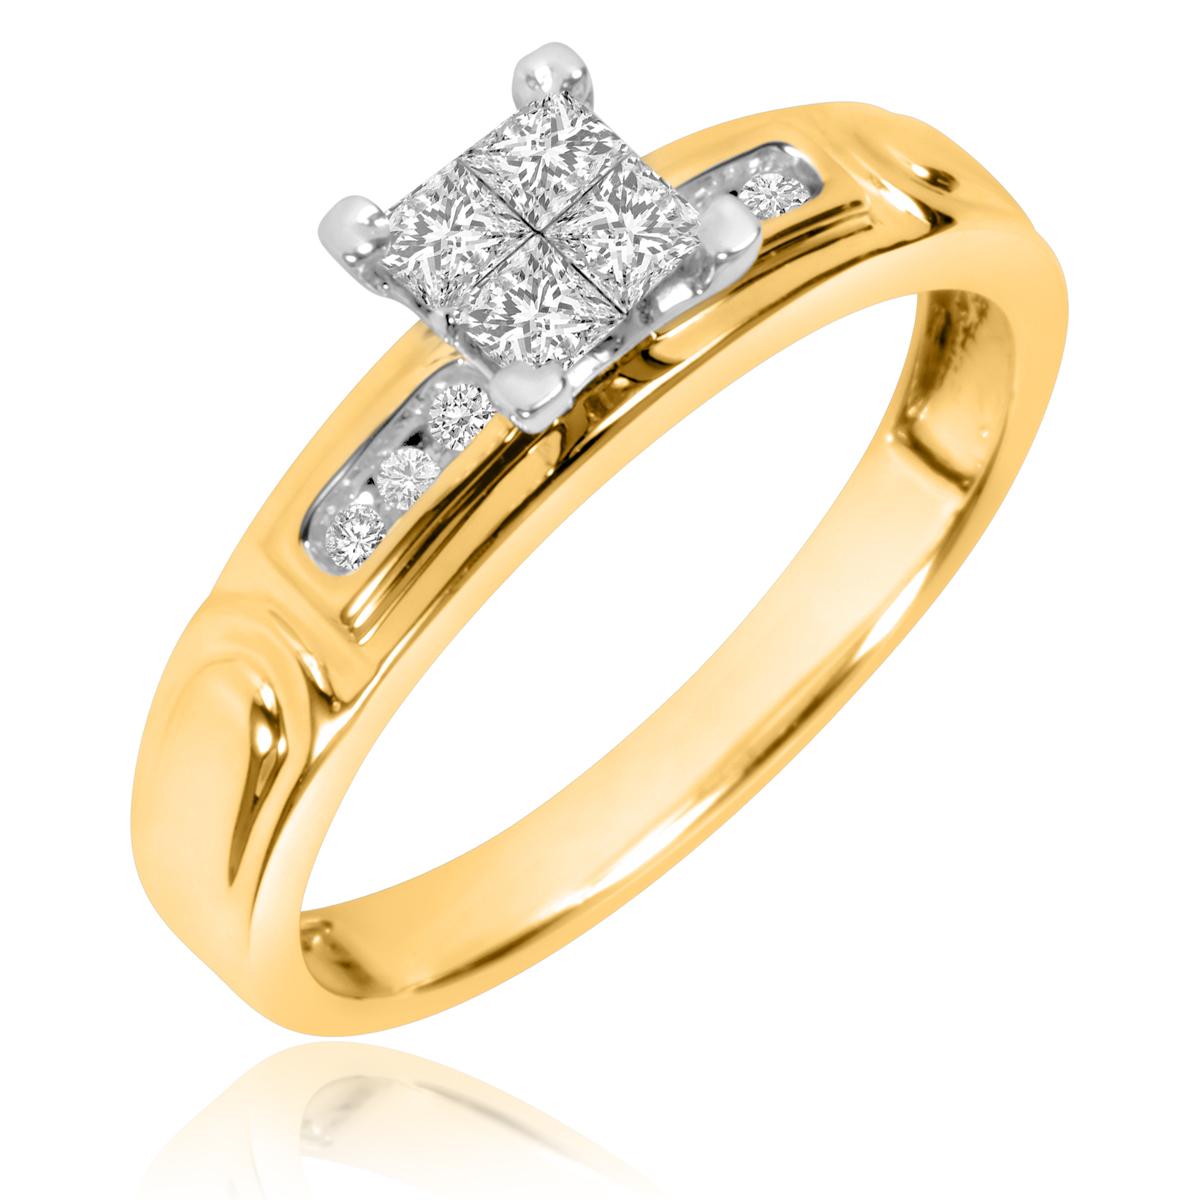 1/3 CT. T.W. Princess, Round Cut Diamond Ladies Engagement Ring 10K Yellow Gold-